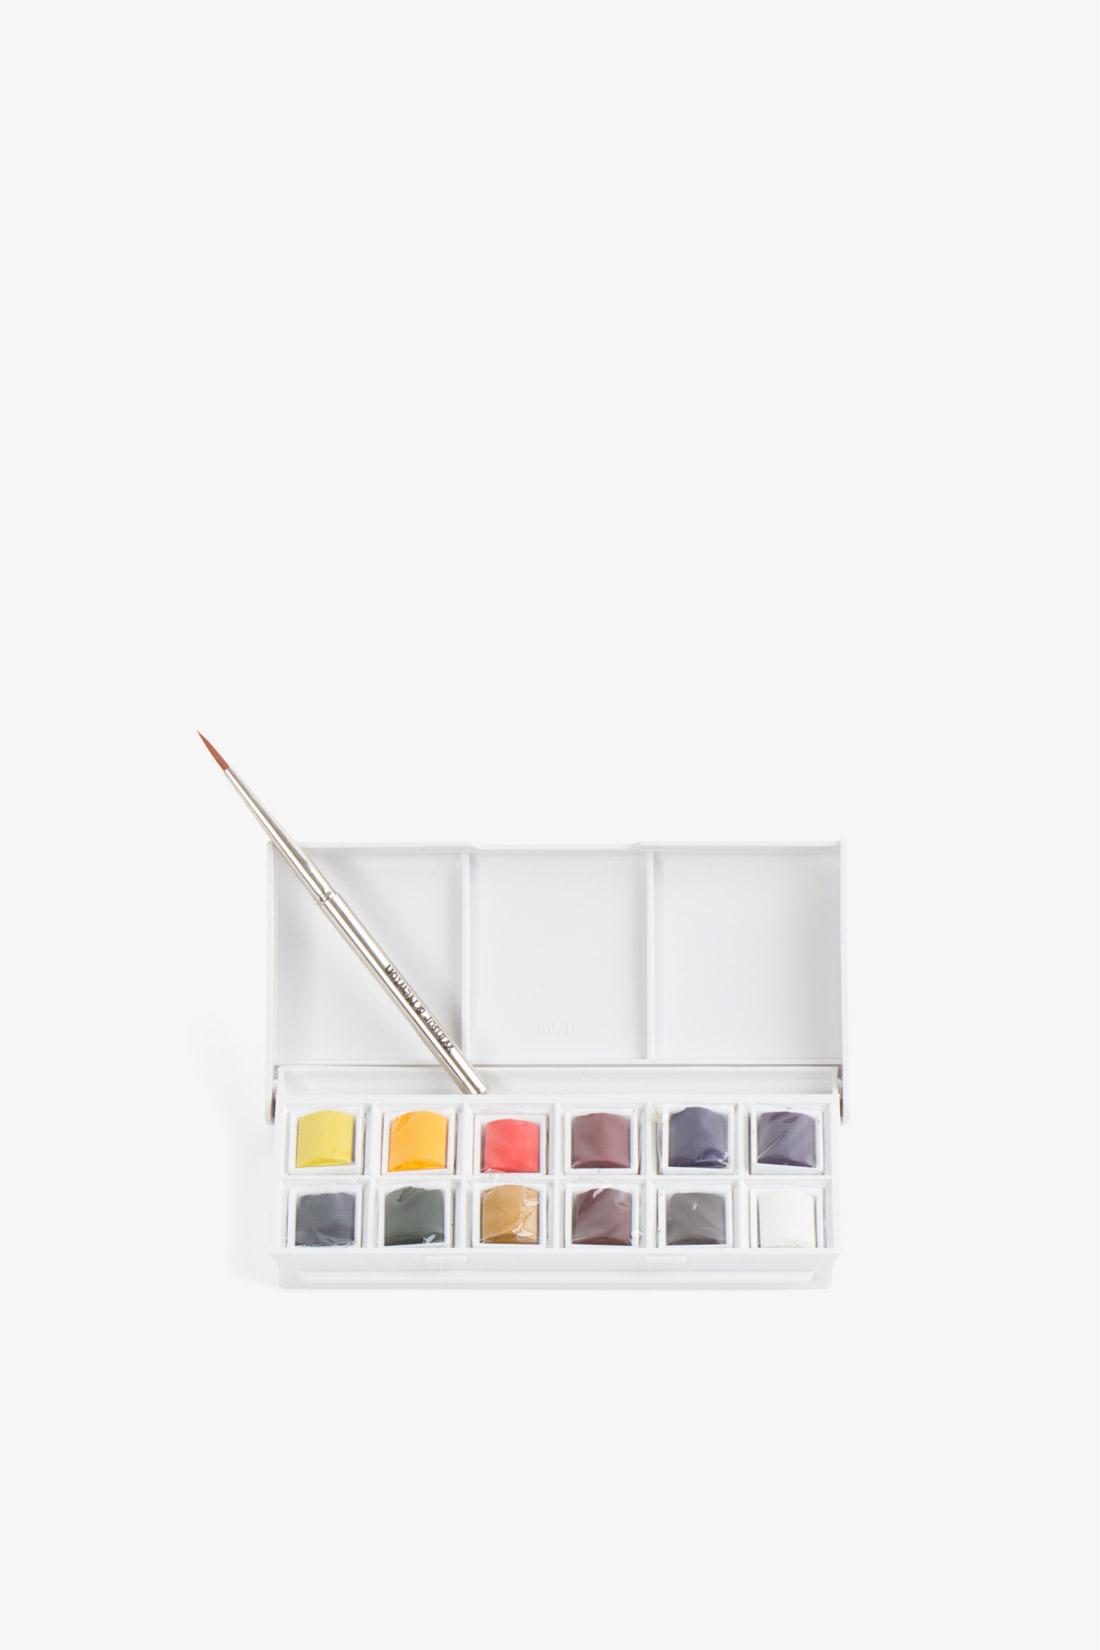 winsor-newton-watercolor-travel-kit-1-1jpg.jpg